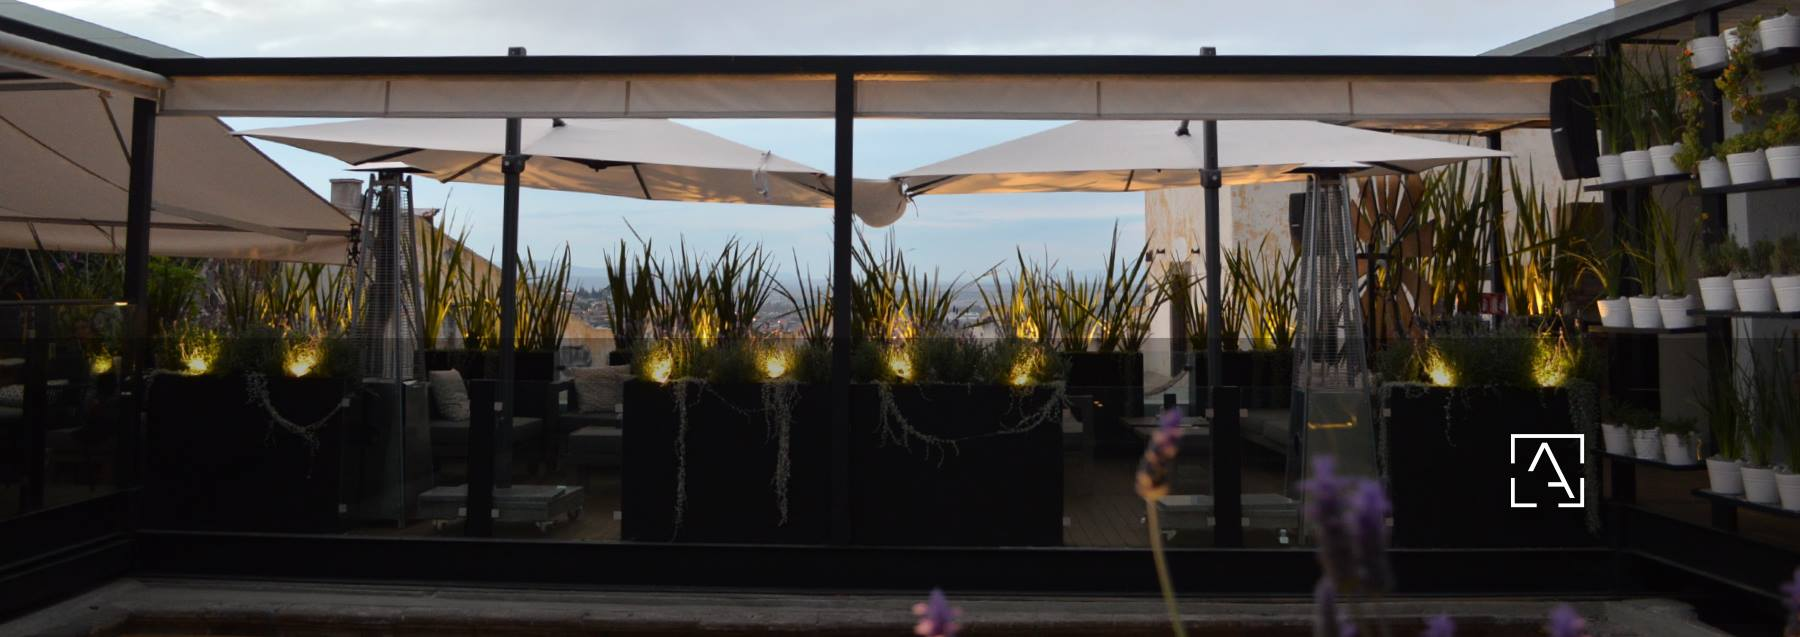 Atrio Restaurant & lounge | Discover San Miguel de Allende